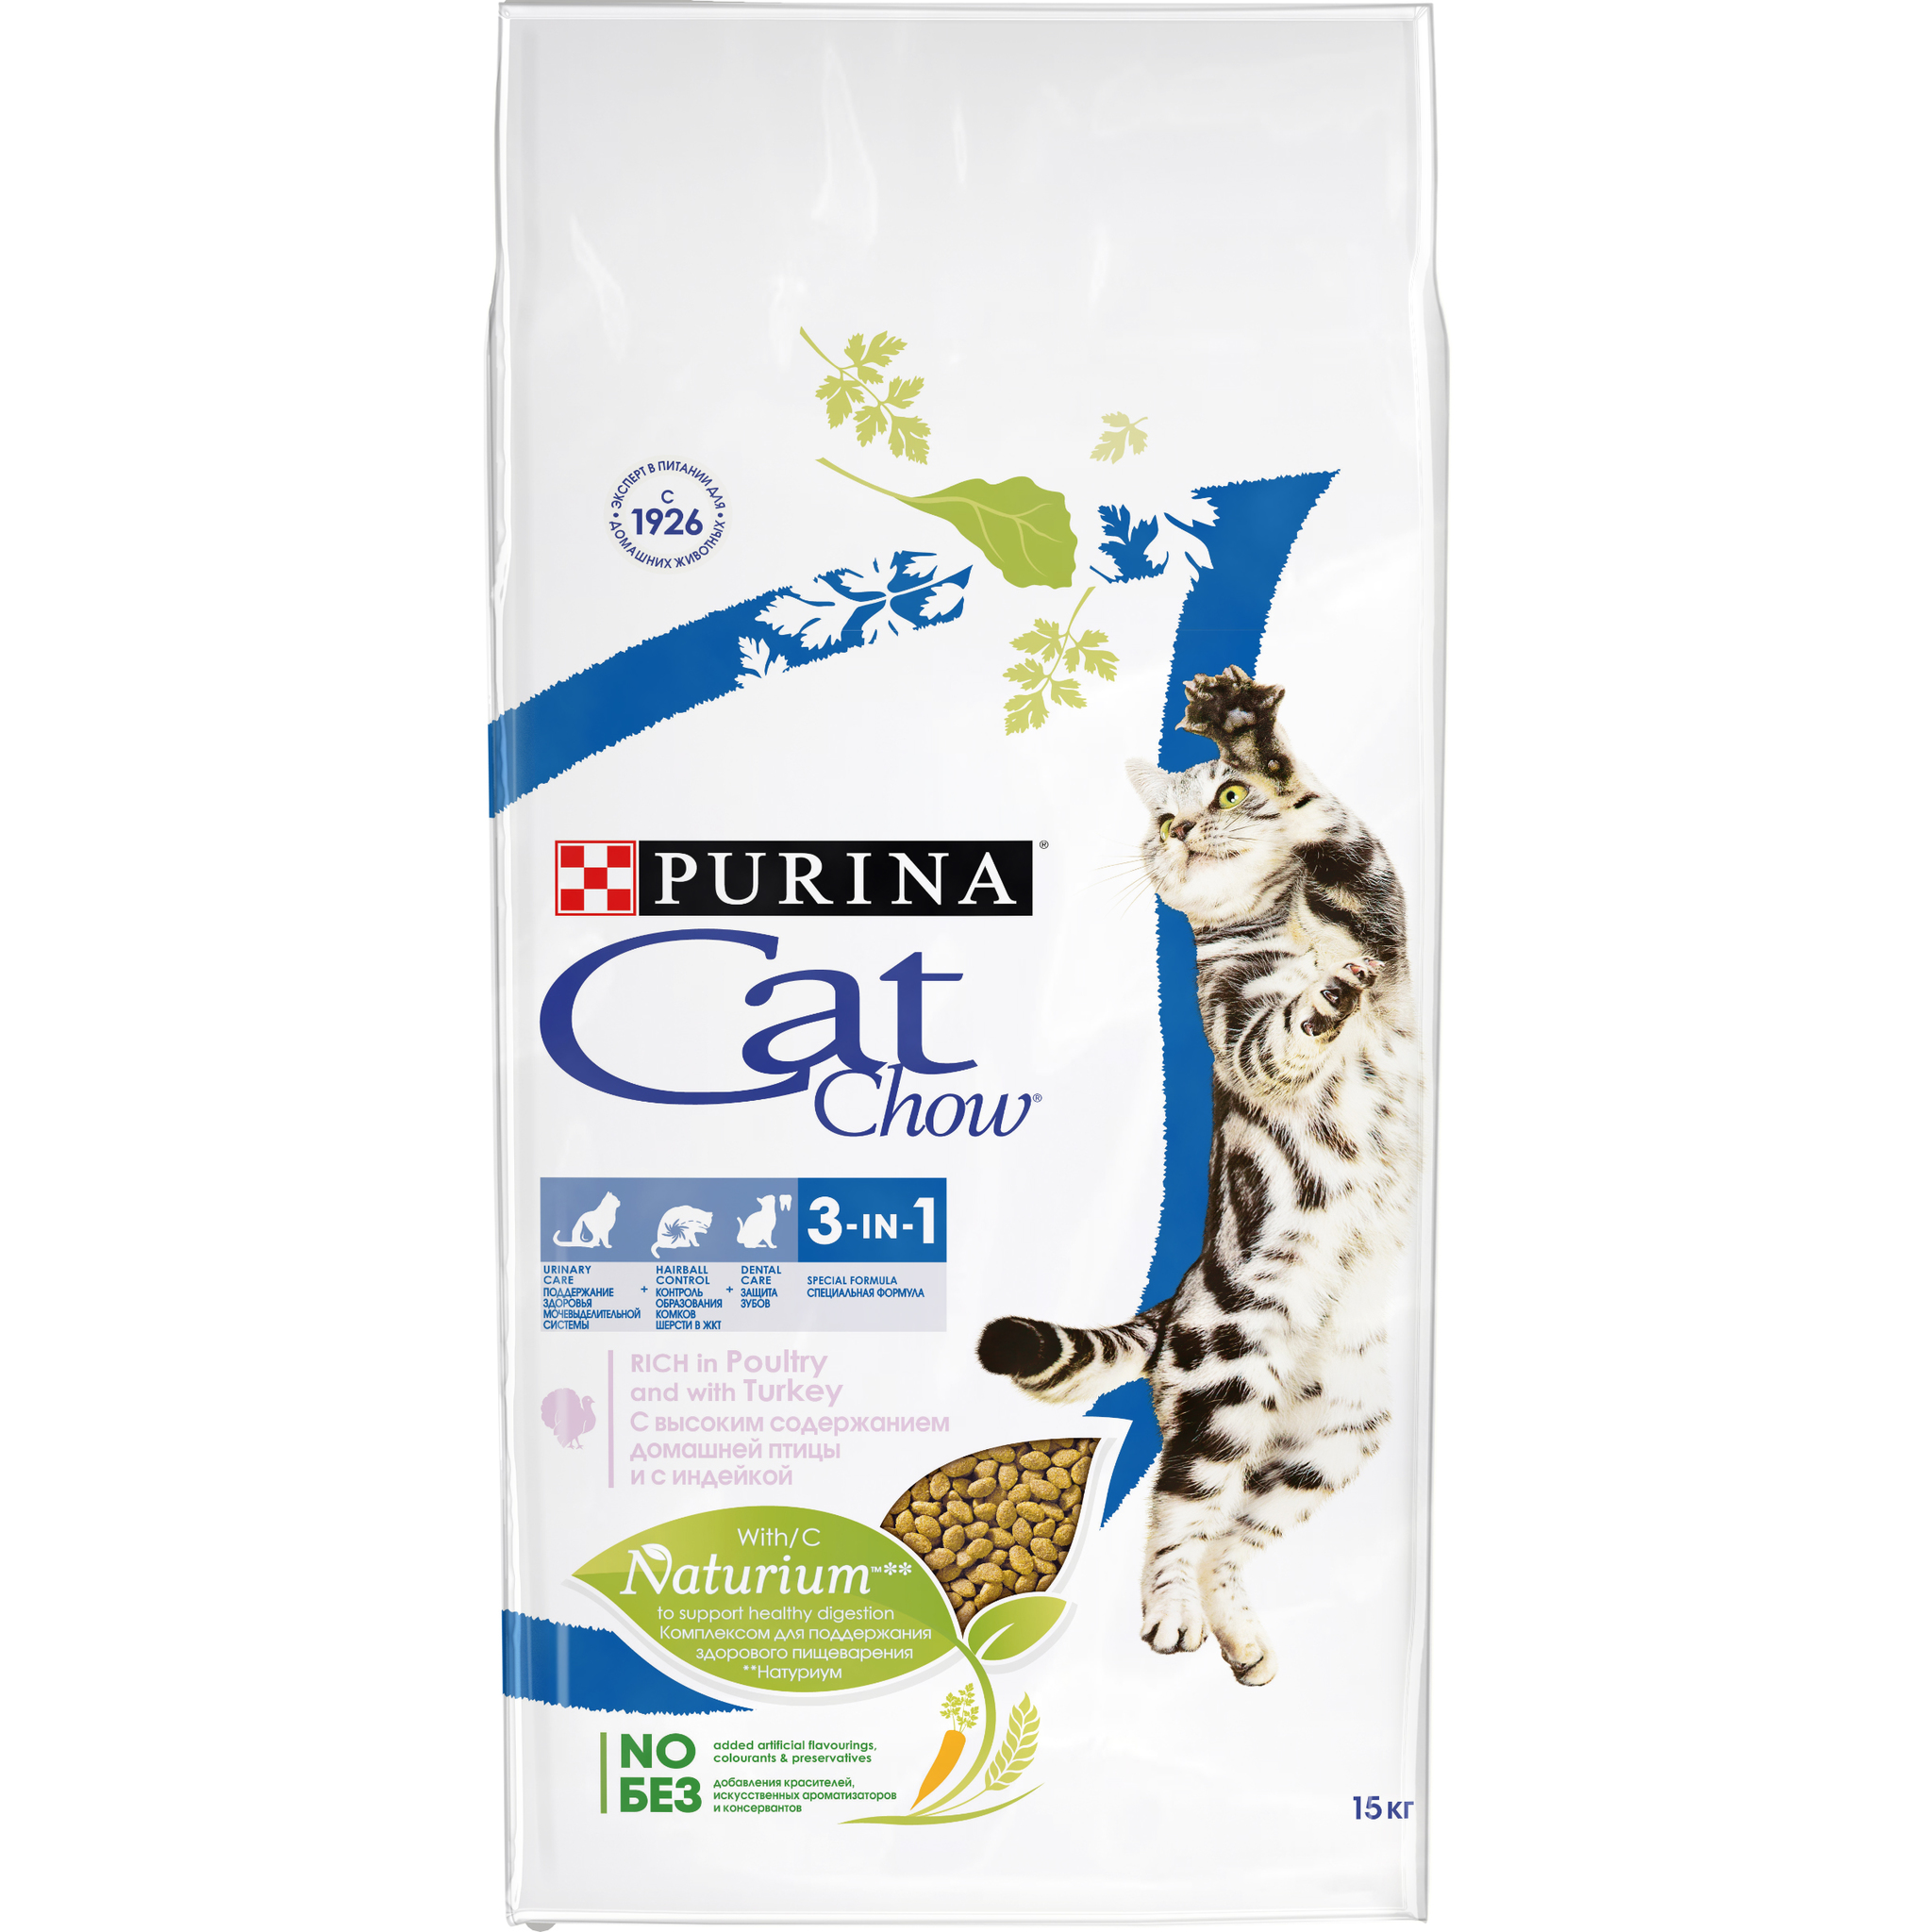 Purina Cat Chow Корм для кошек, Purina Cat Chow Feline 3 in 1, с формулой тройного действия 12392567.jpg